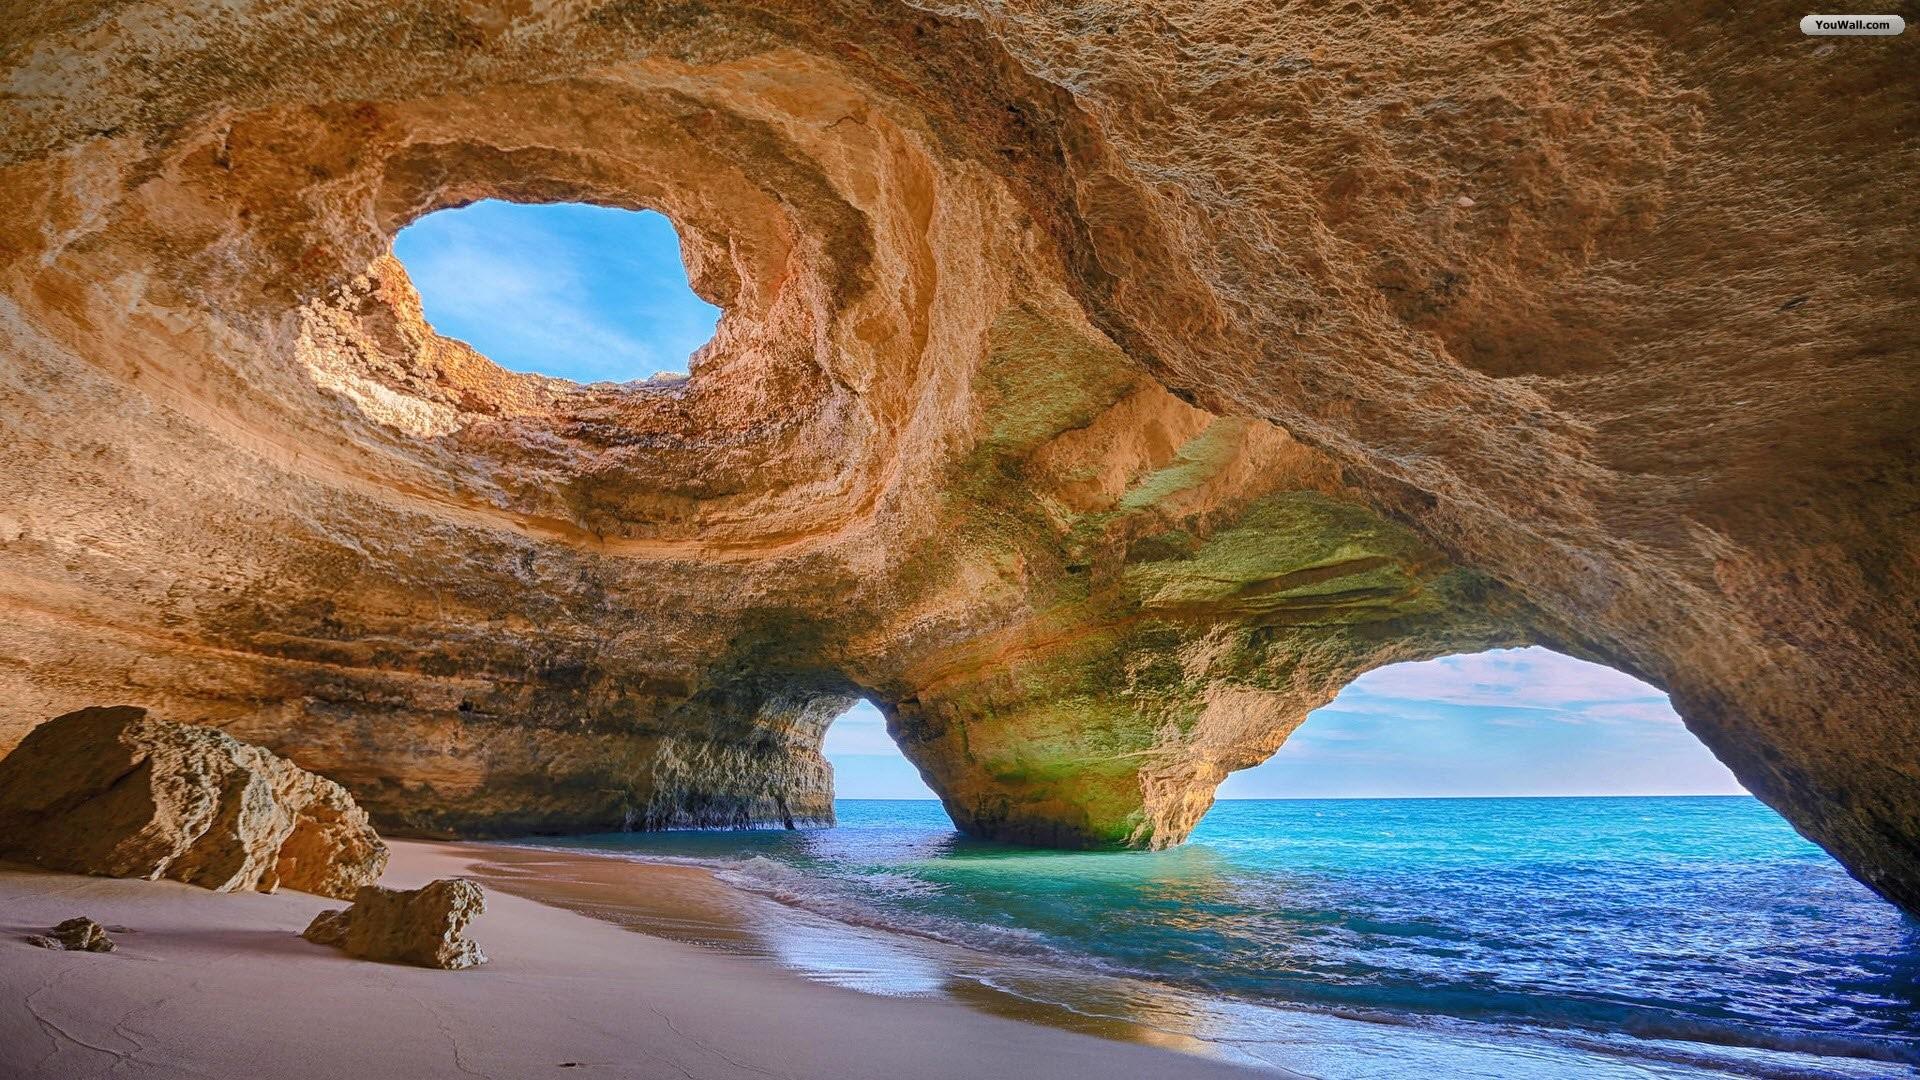 Algarve Caves Beach Wallpaper